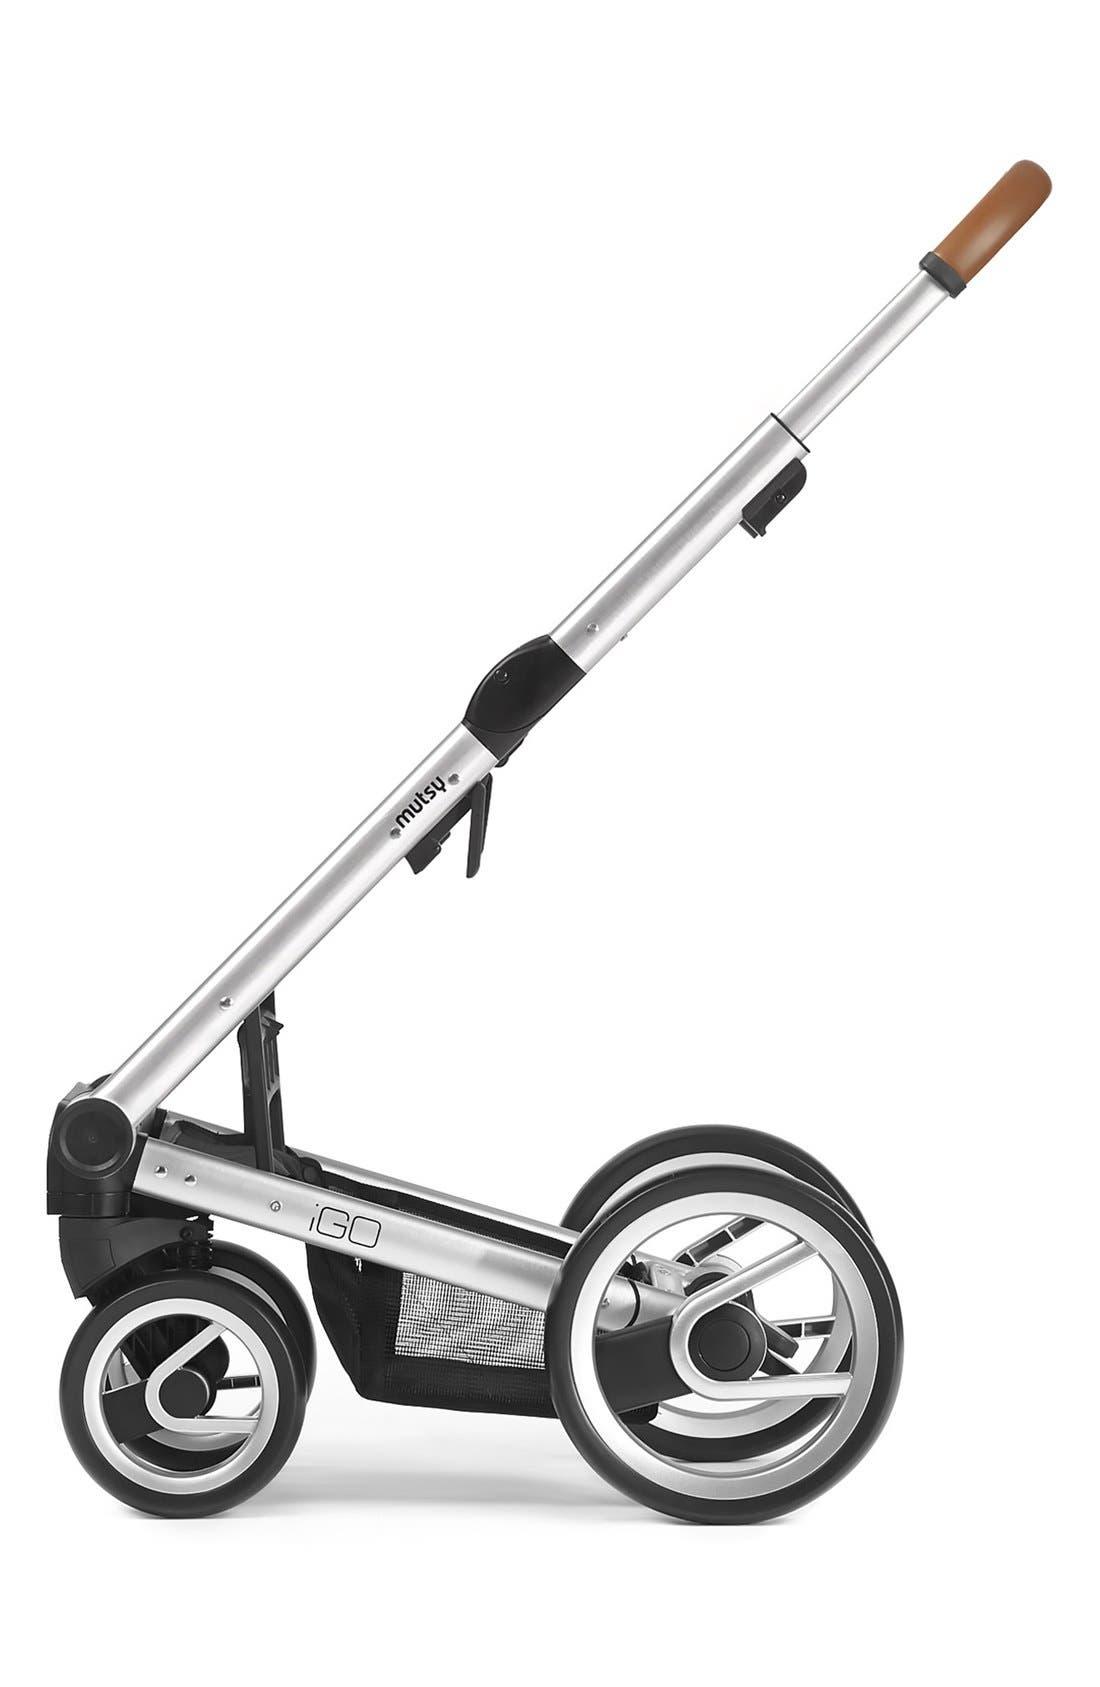 Igo - Urban Nomad Stroller,                             Alternate thumbnail 3, color,                             020